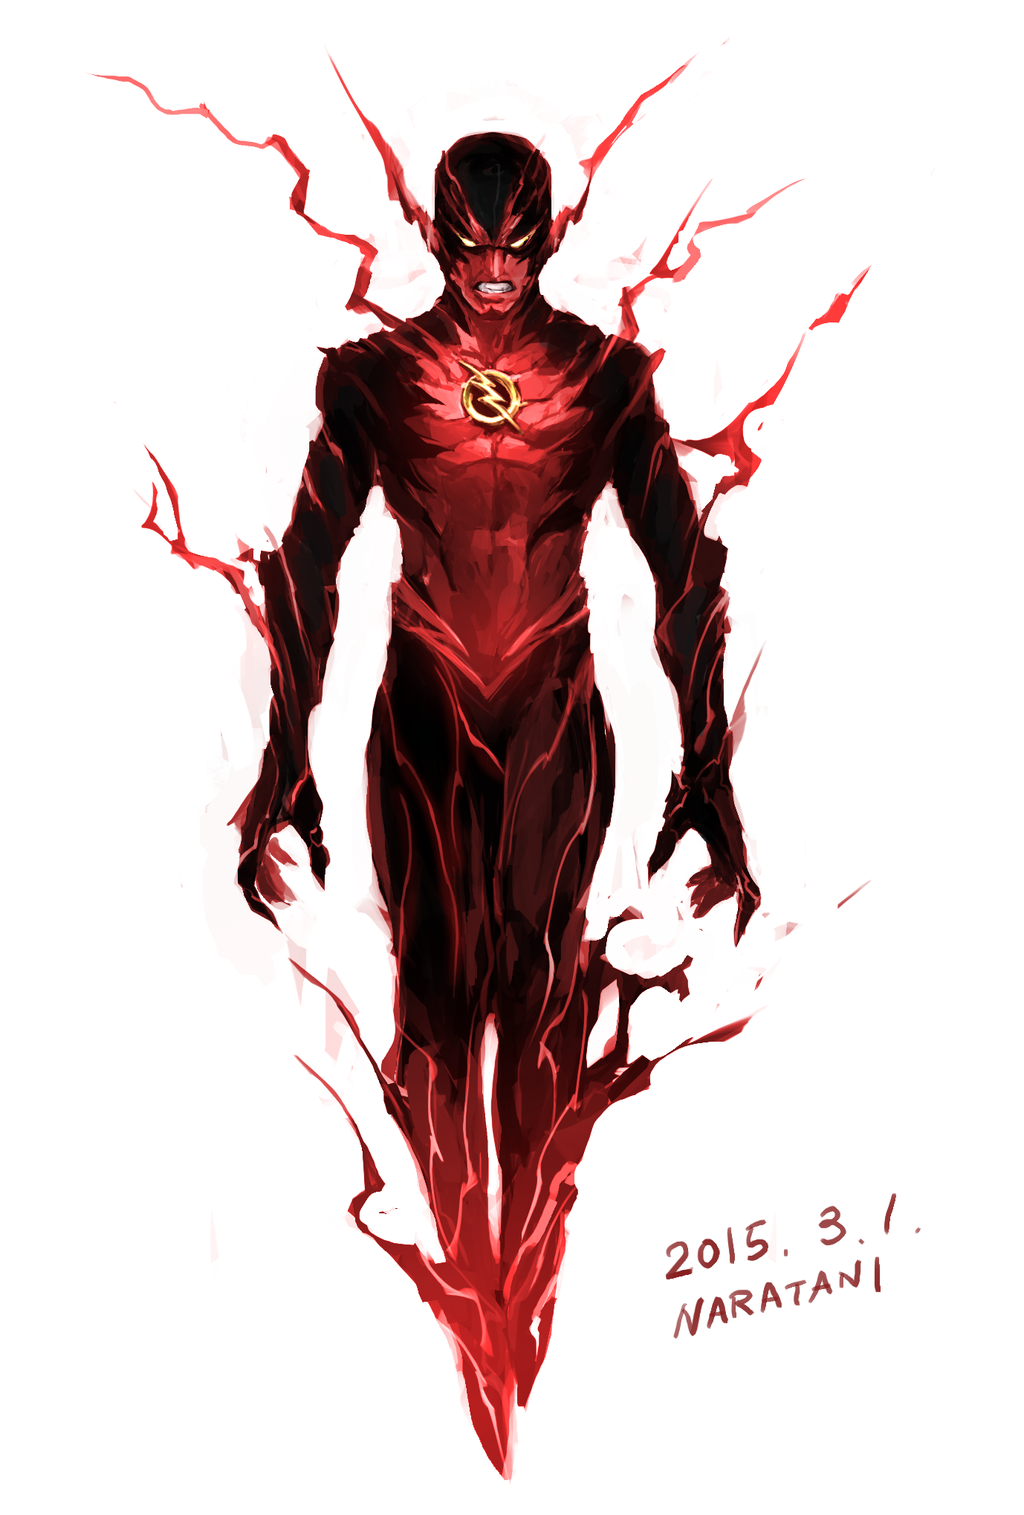 West Coast Avengers Reverse Flash Flash Characters Superhero